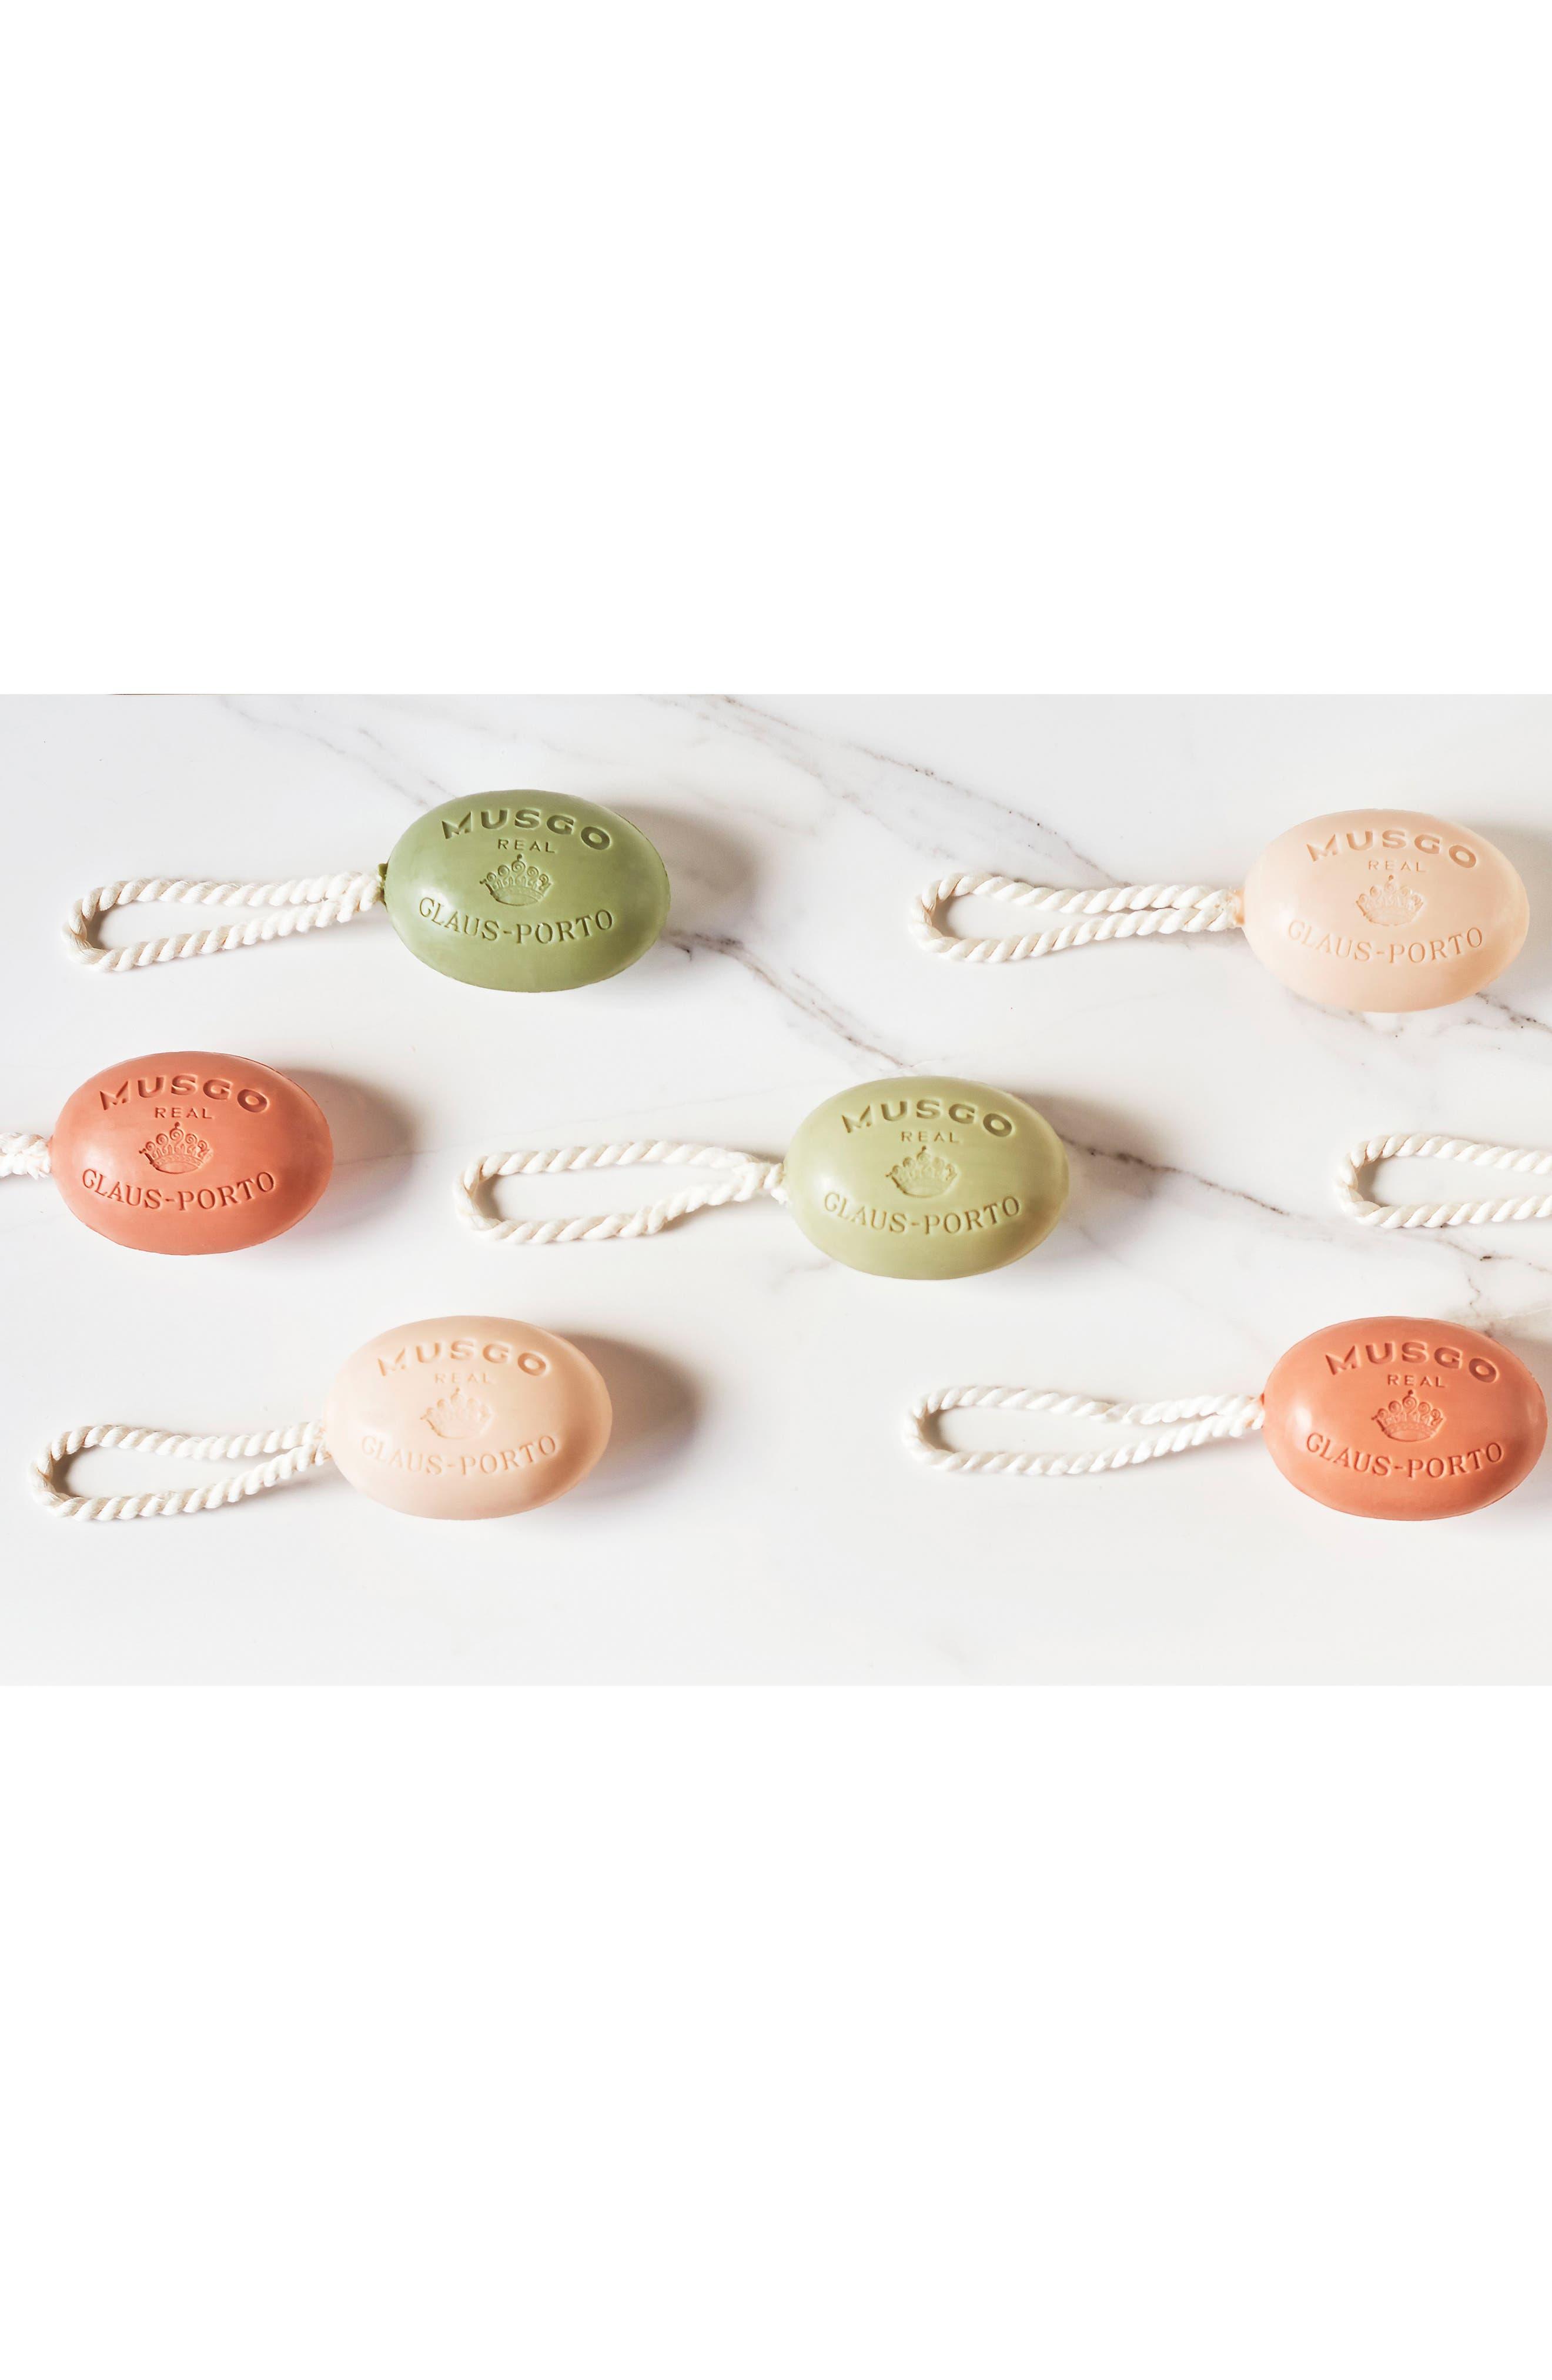 Oak Moss Soap on a Rope,                             Alternate thumbnail 3, color,                             000